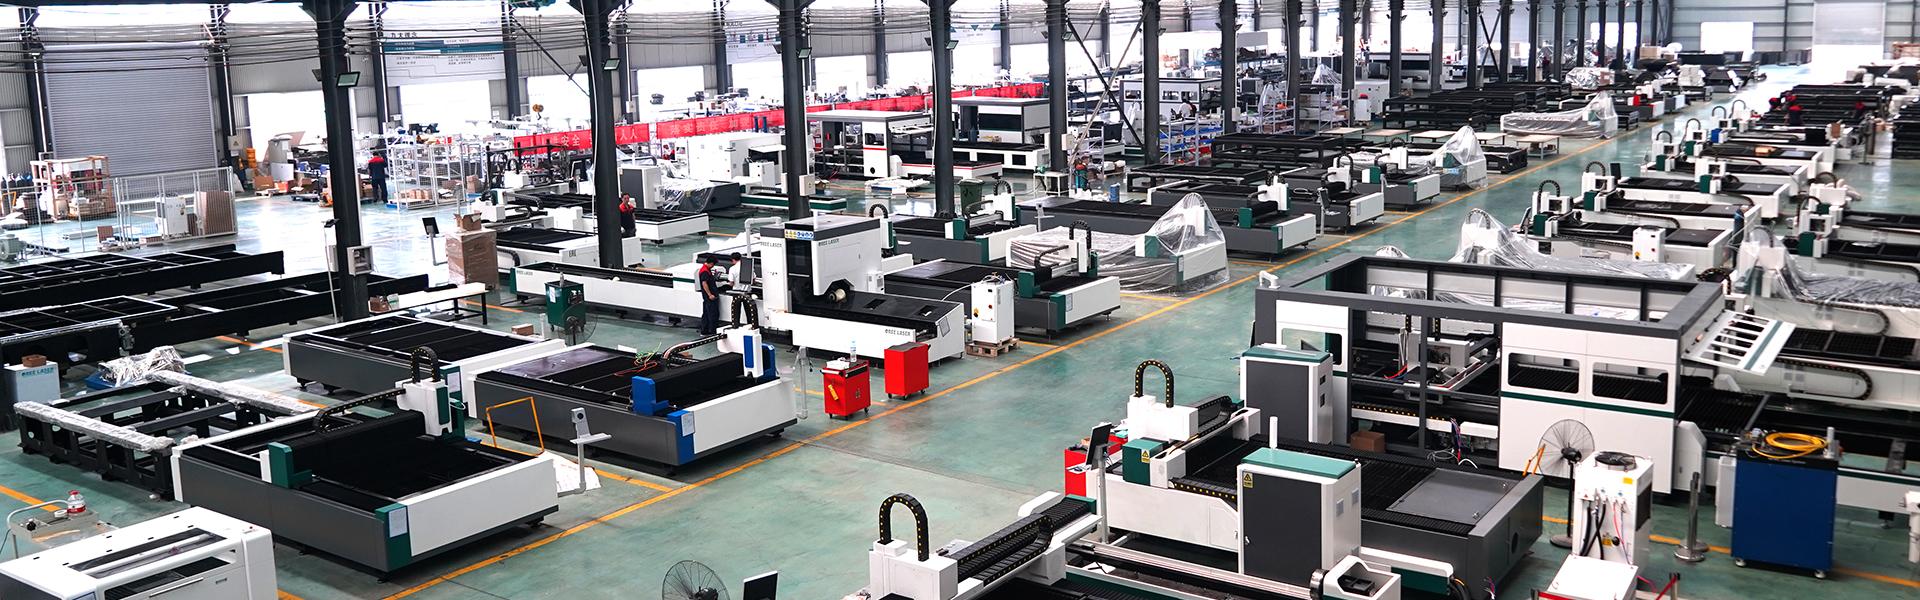 fiber laser cutting machine workshop